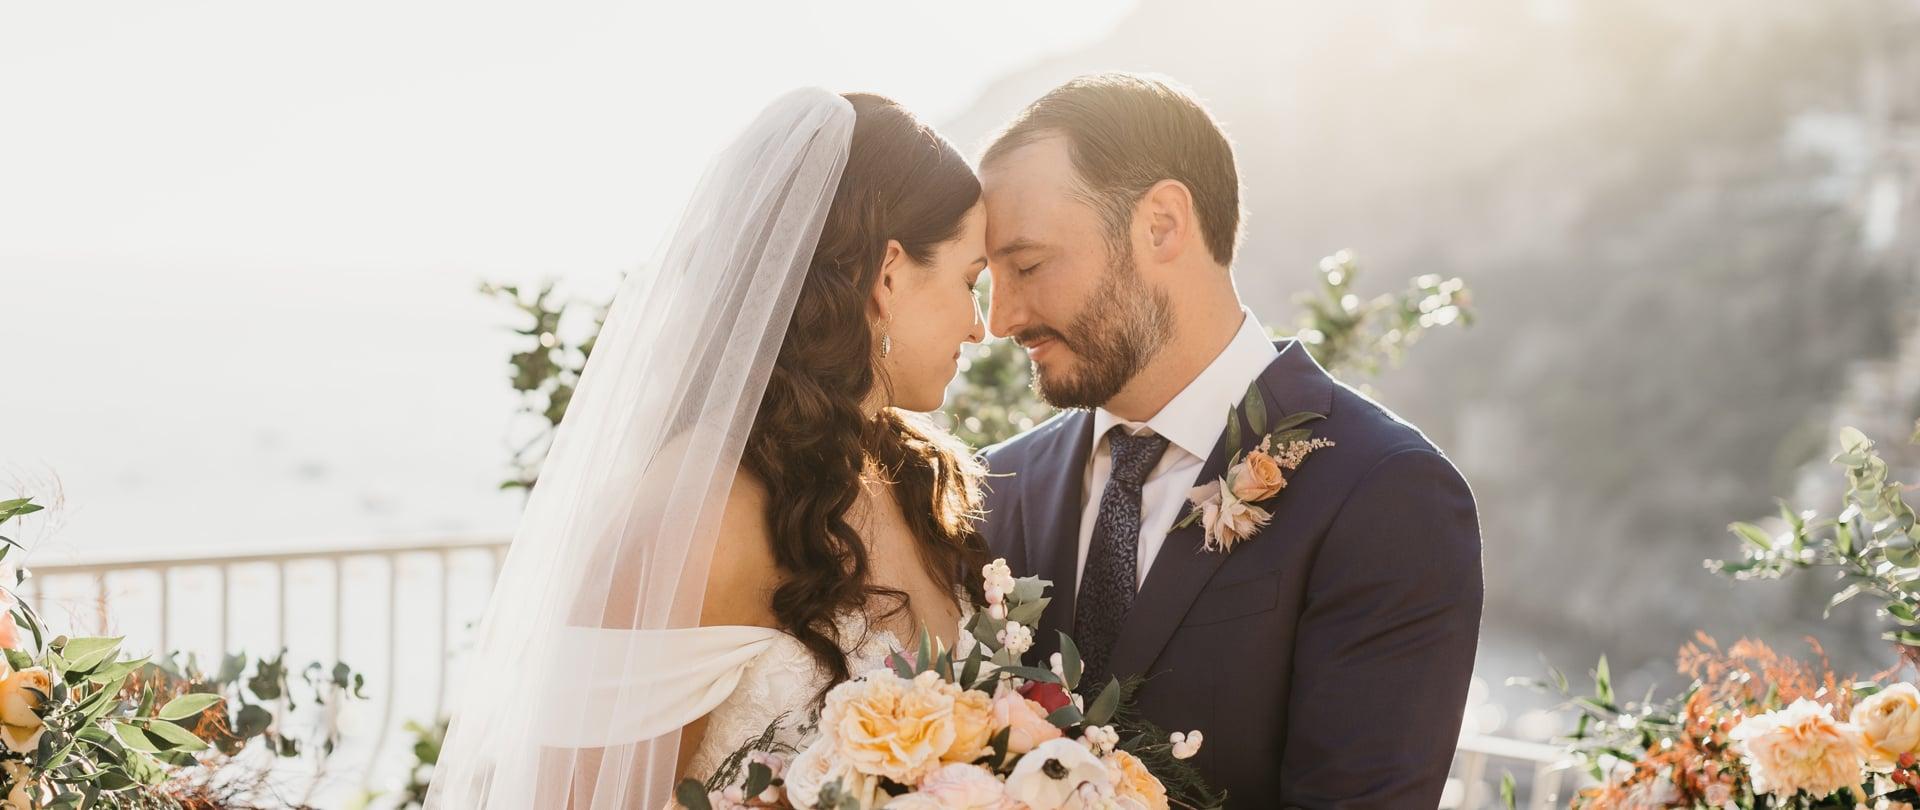 Sara & Austin Wedding Video Filmed at Positano, Italy